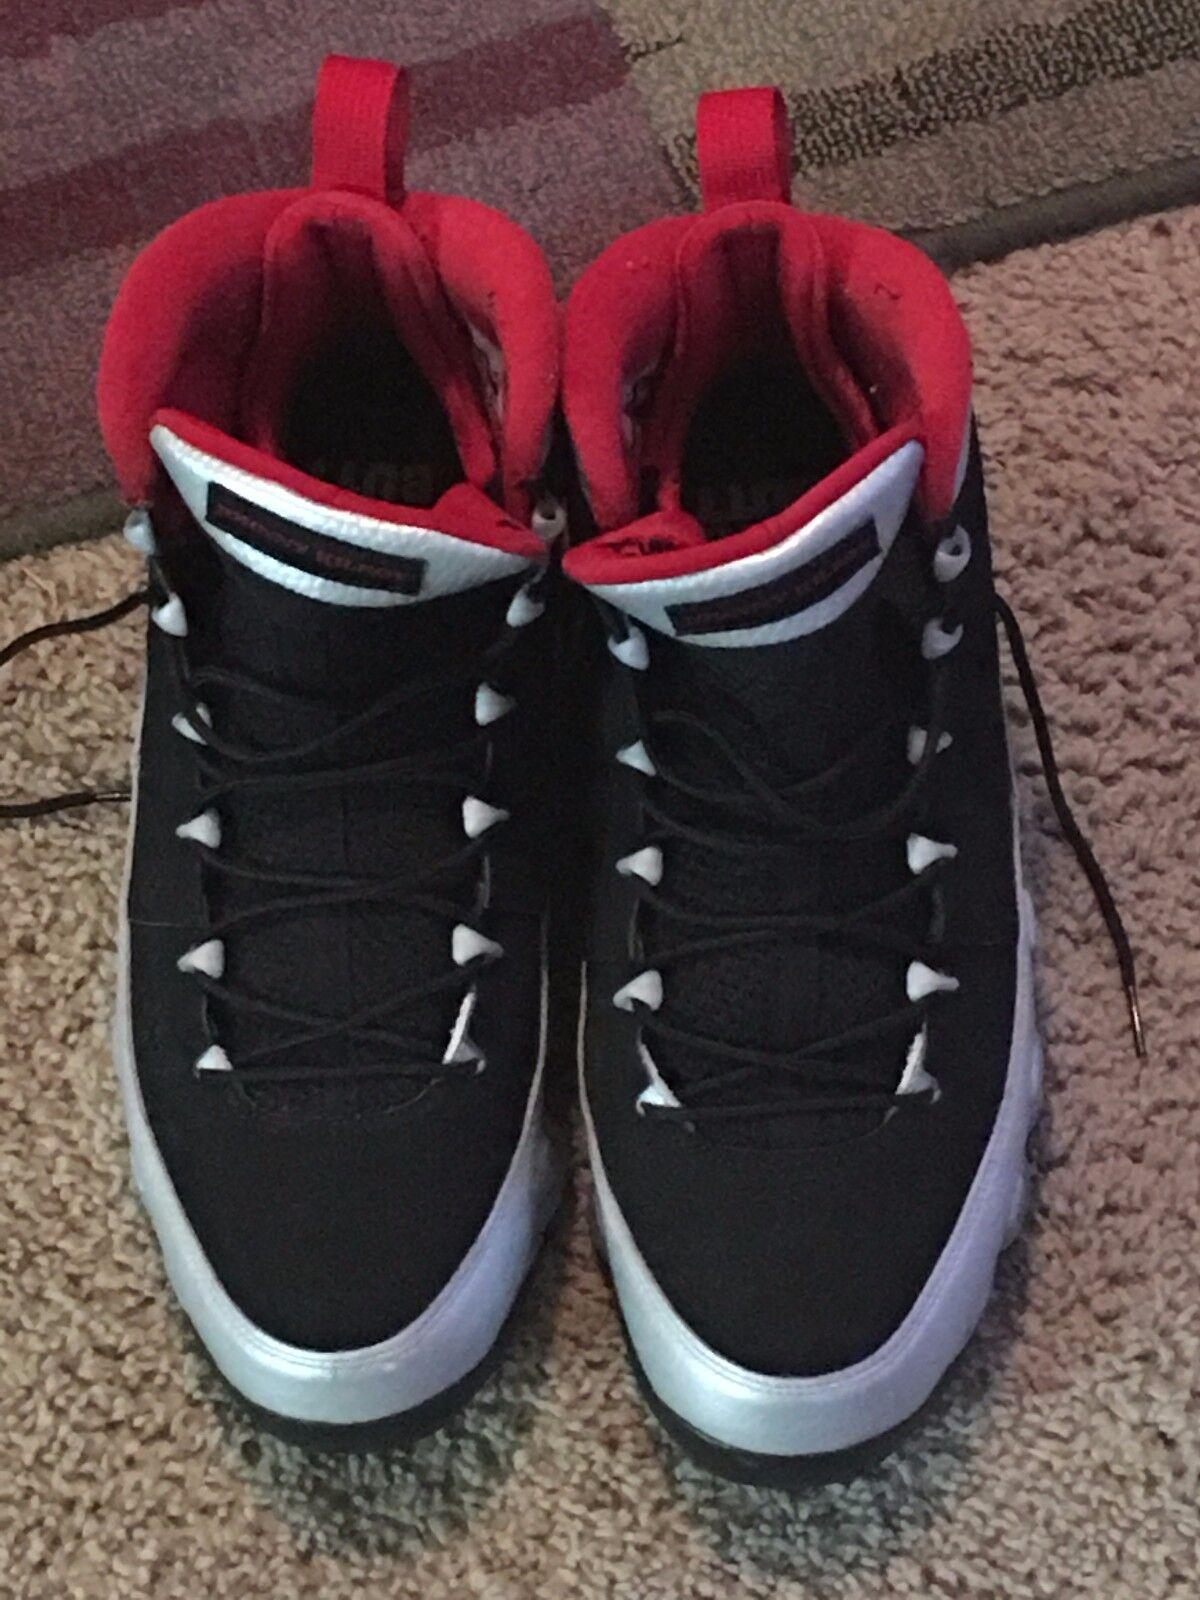 Jordan 9 Kilroy Black, silver and Red sz 13